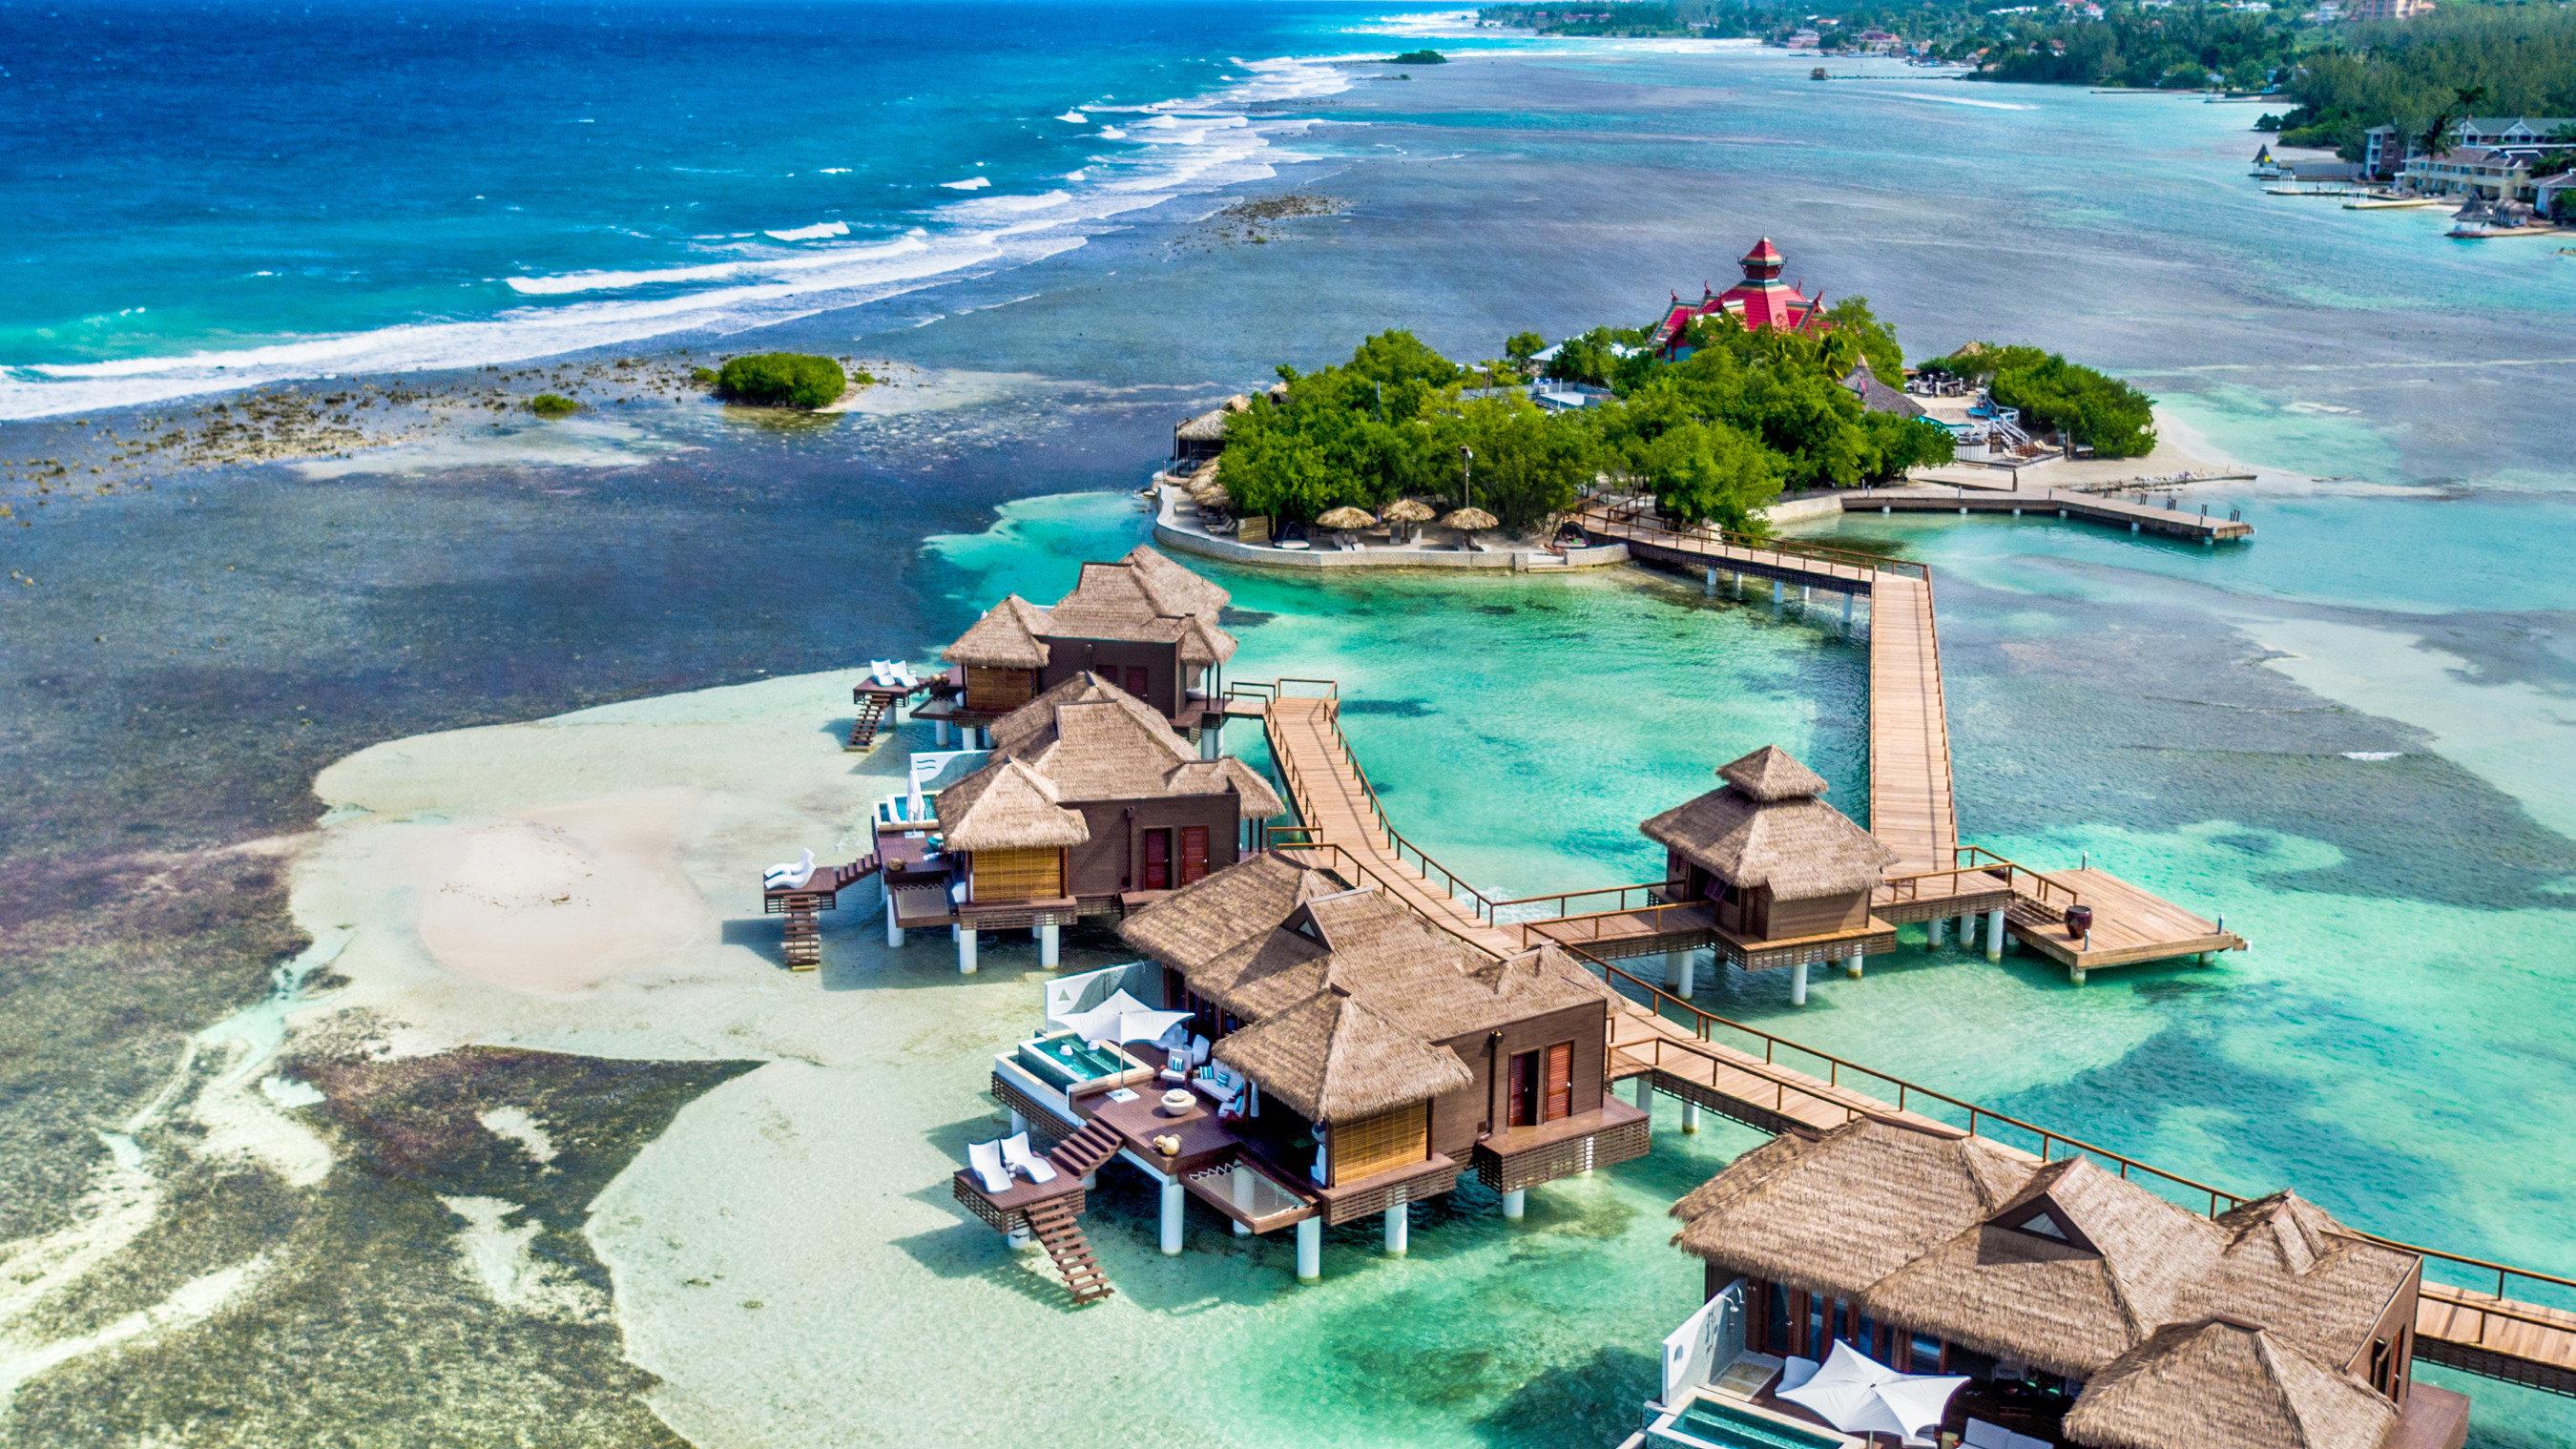 All Inclusive Resorts Hotels Water Sea Outdoor Coast Nature Vacation Ocean Caribbean Beach Bay Resort